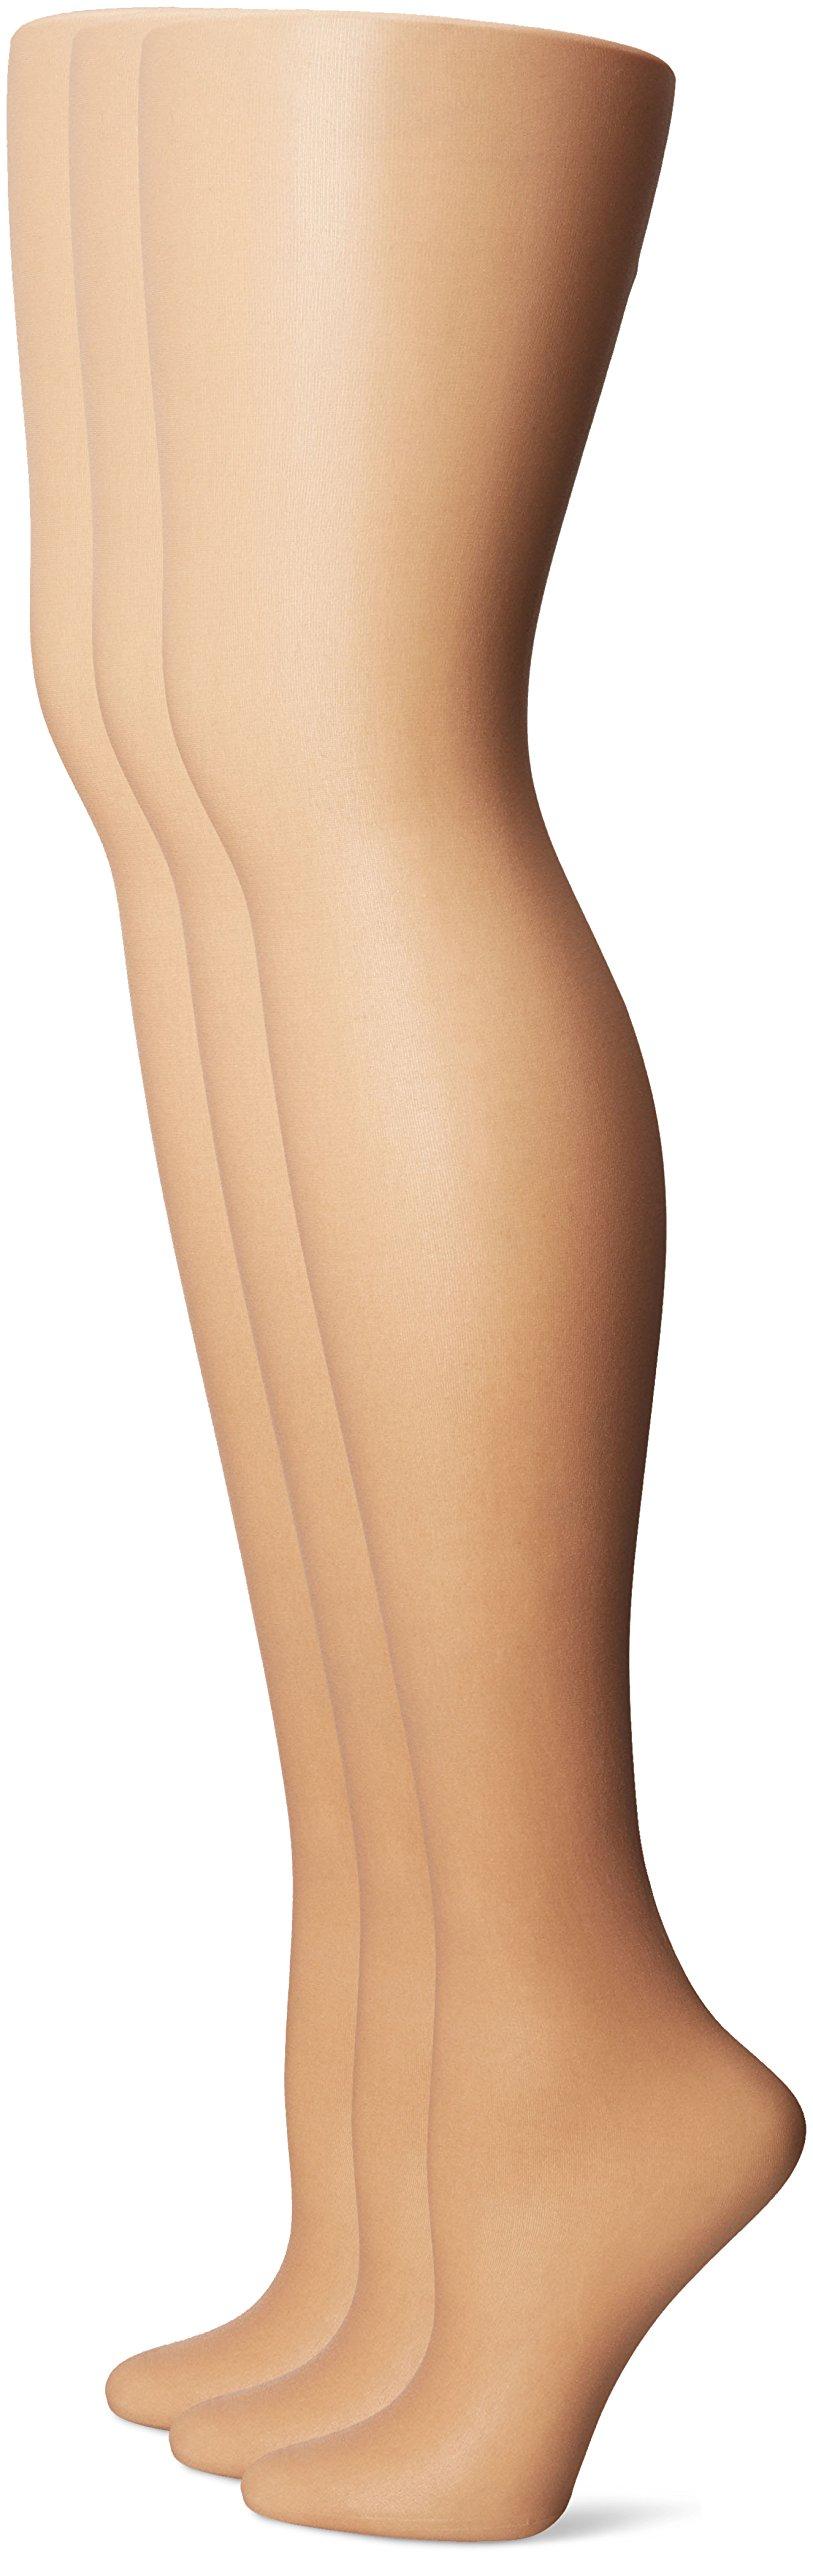 No Nonsense Women's Control Top Pantyhose 3-Pack, Tan, A